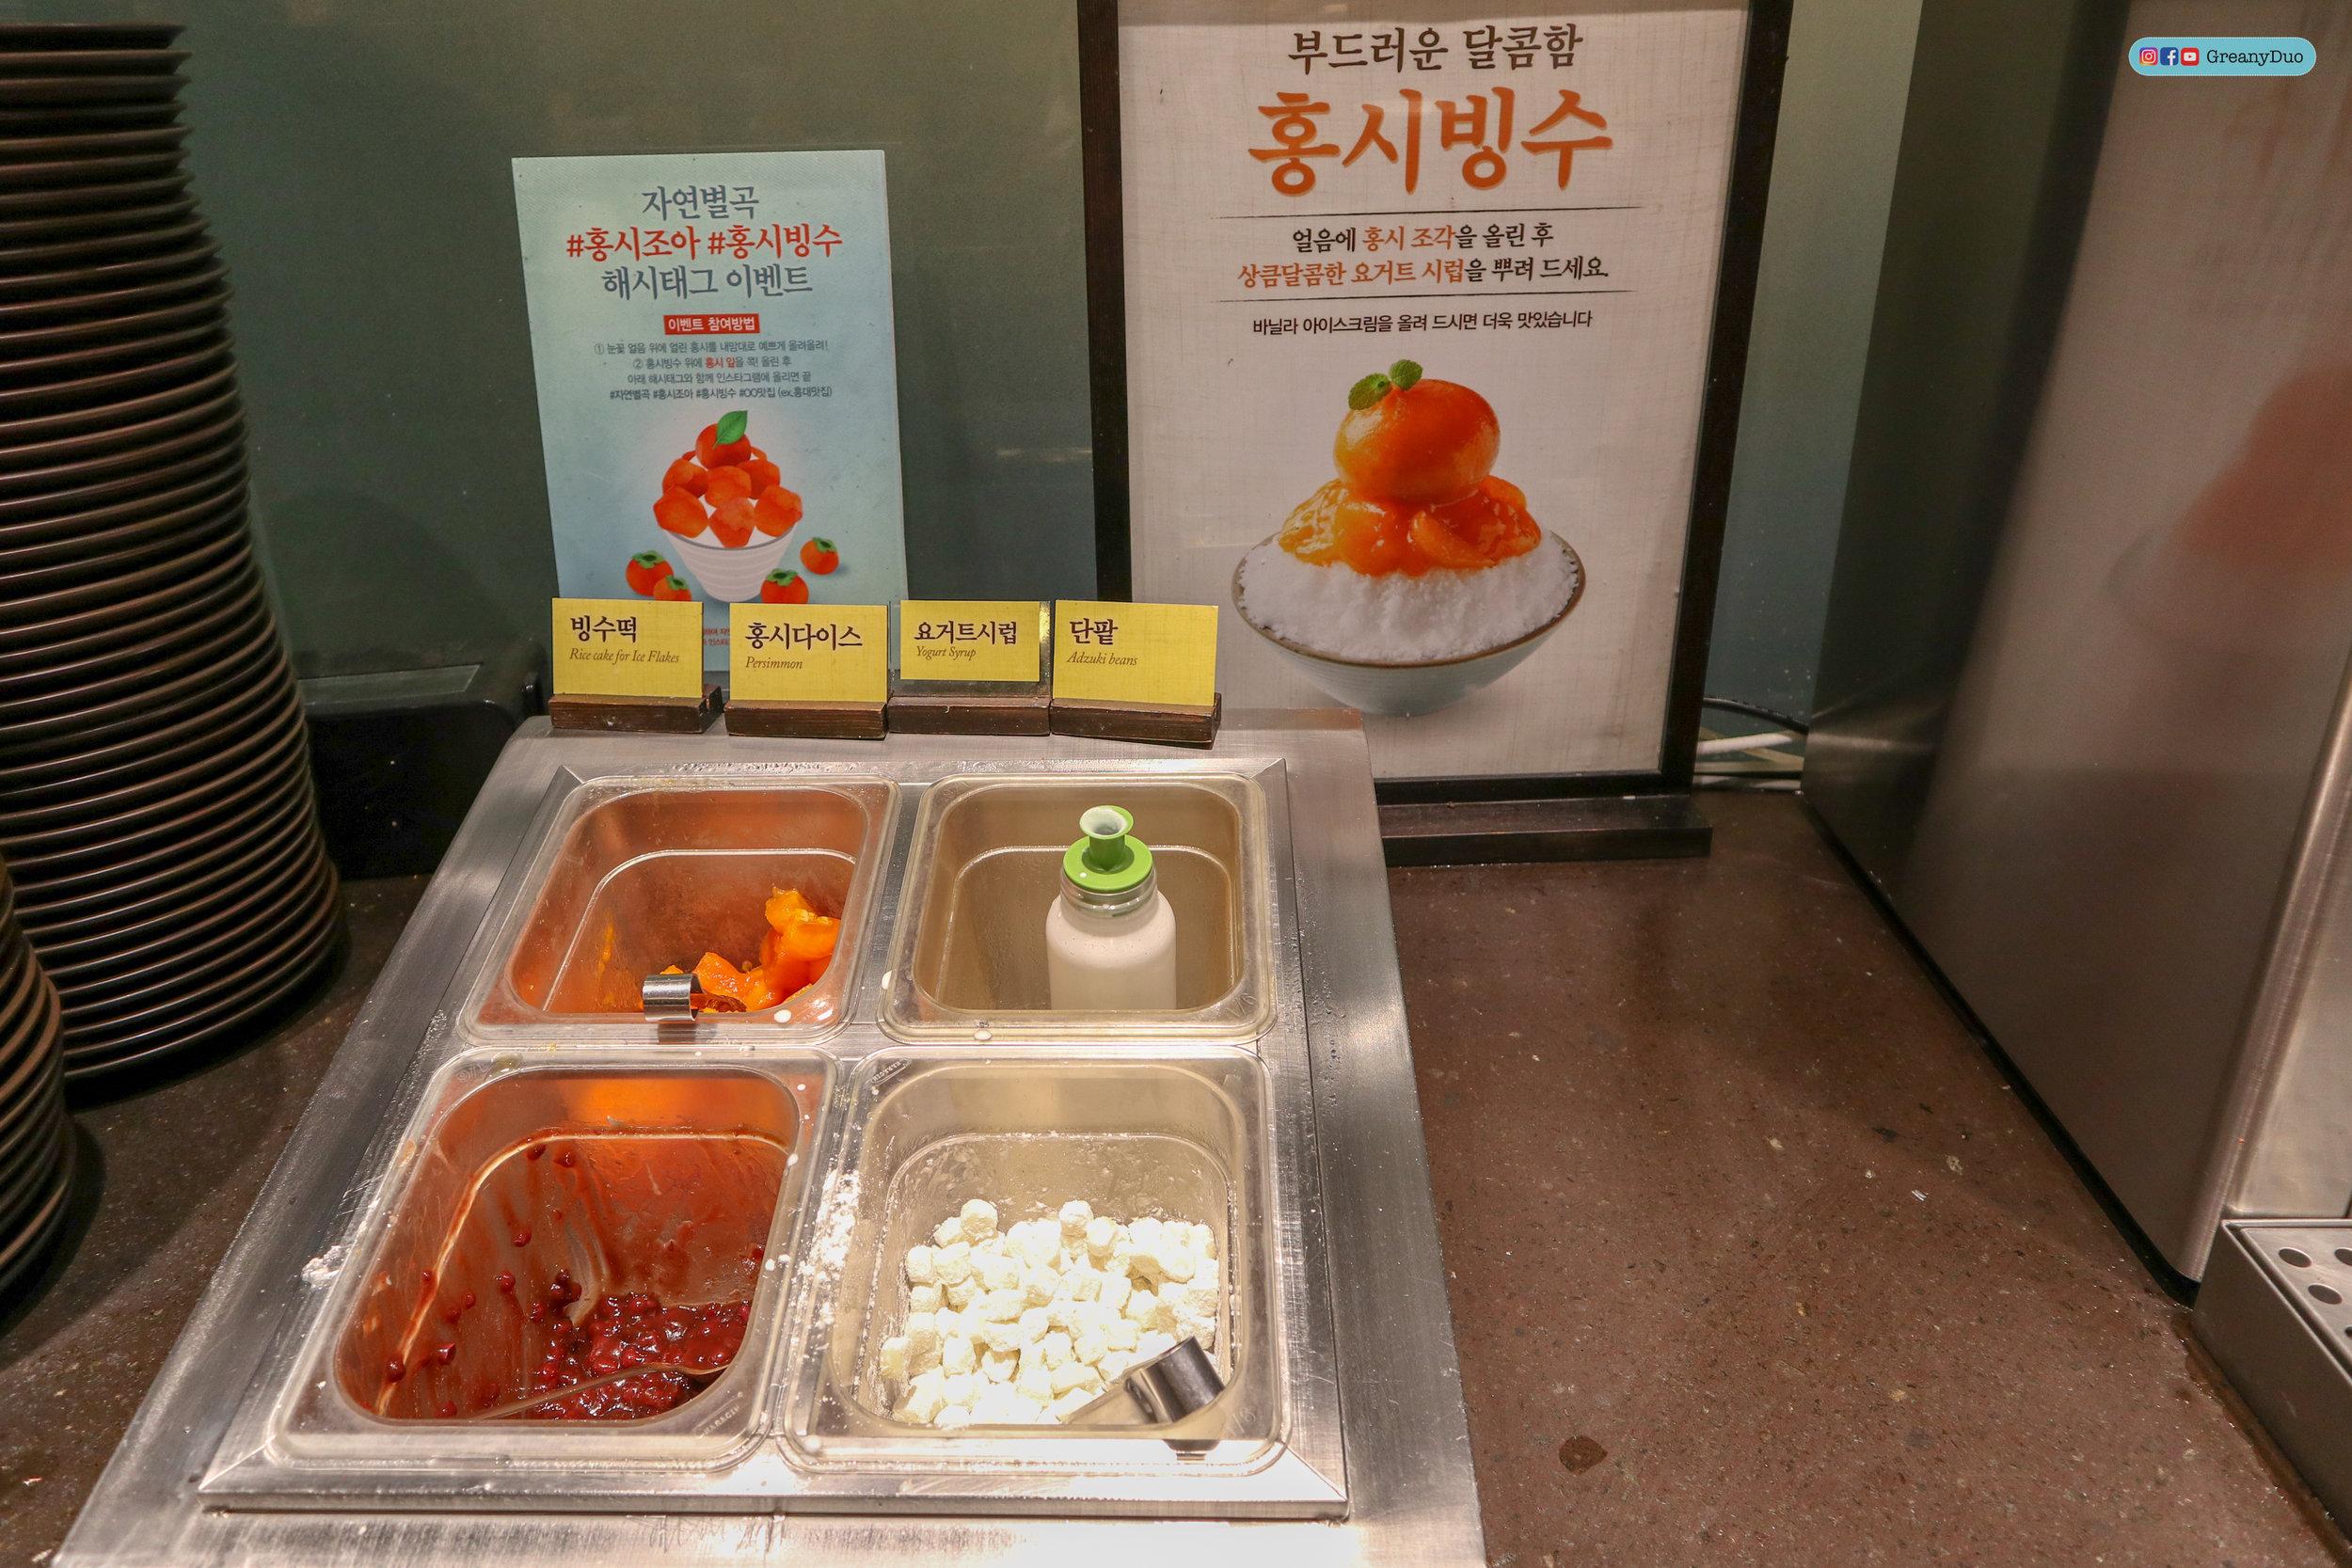 diy bingsu, nature kitchen buffet, seoul korea